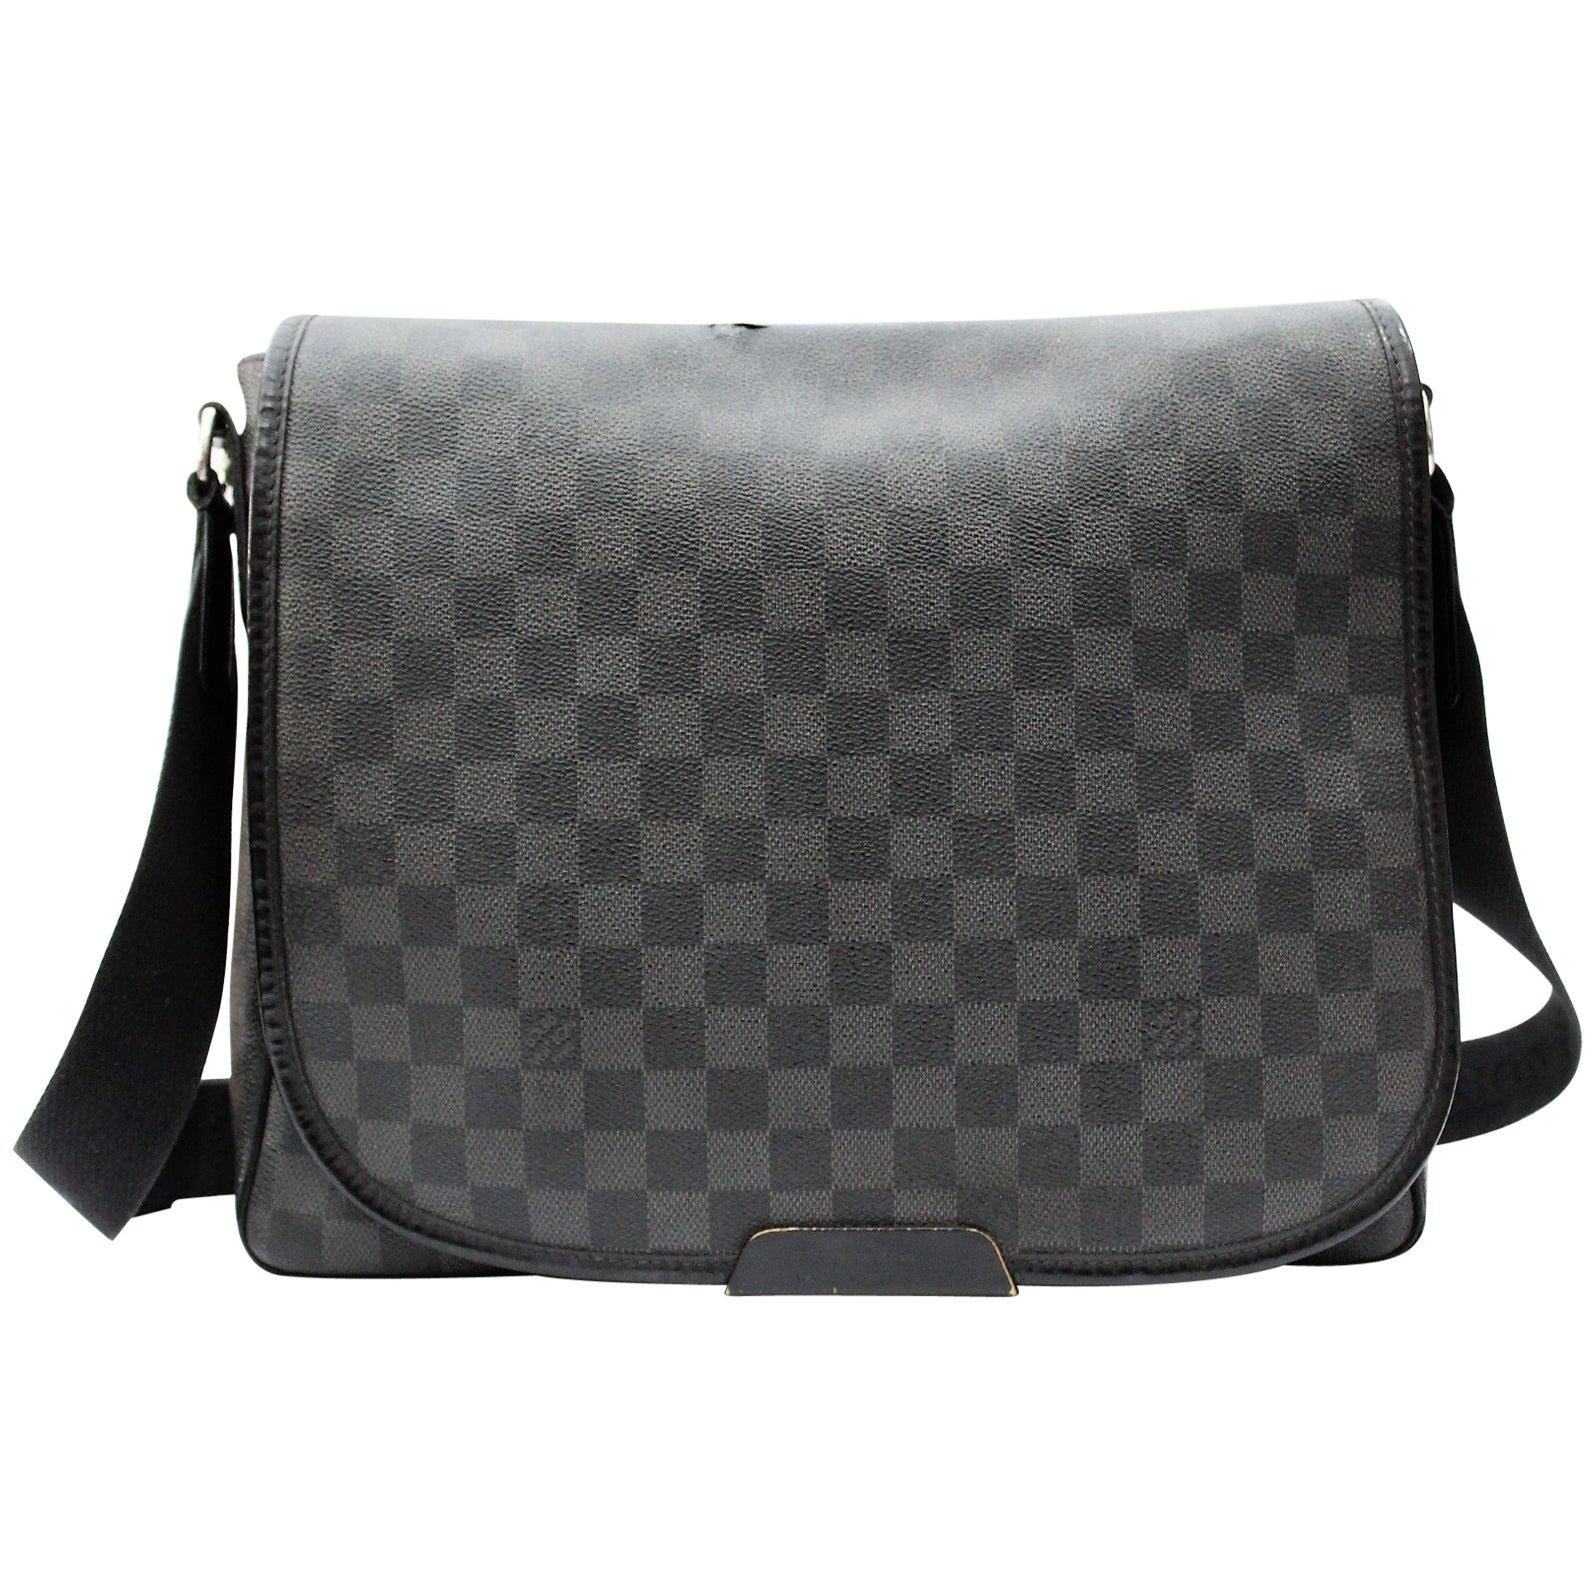 cdb6289a73 Louis Vuitton Damier Graphite Crossbody Bag